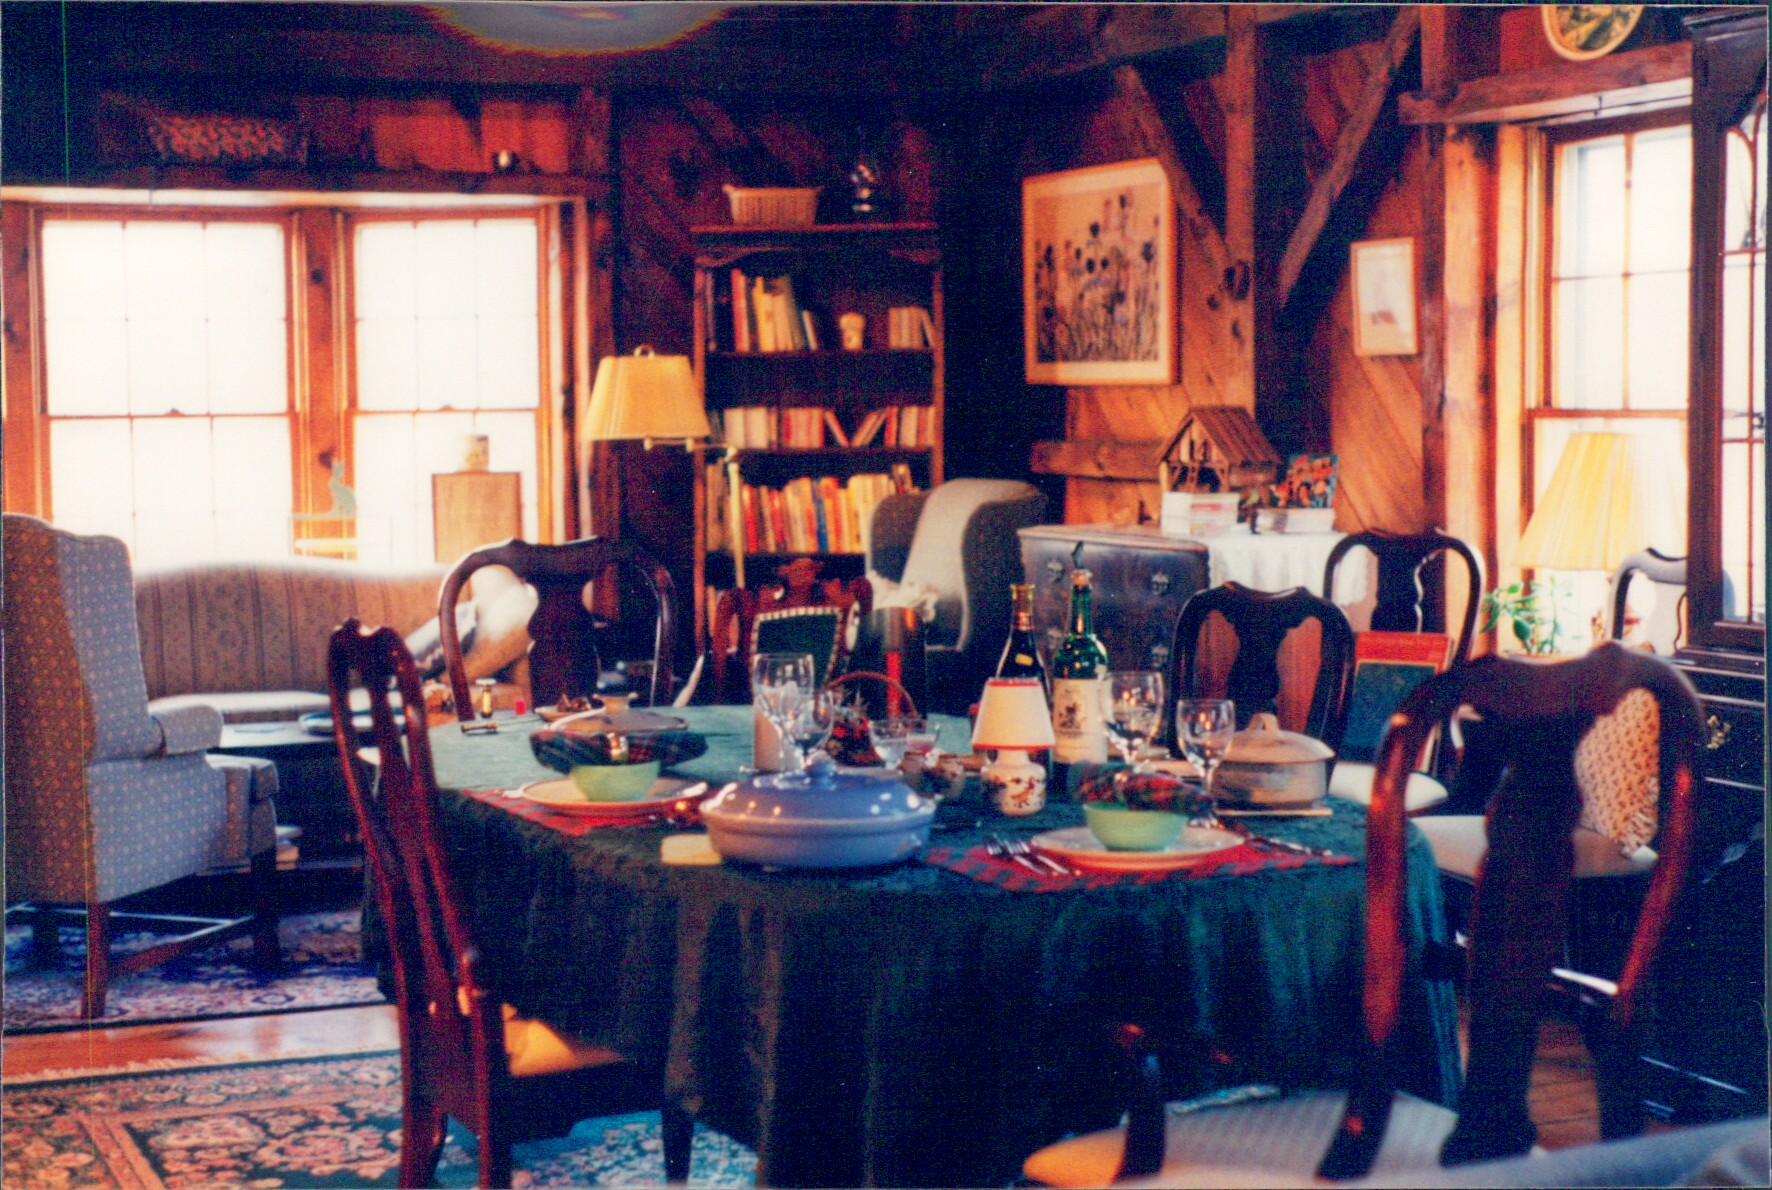 thanksgivingwaterboro1995